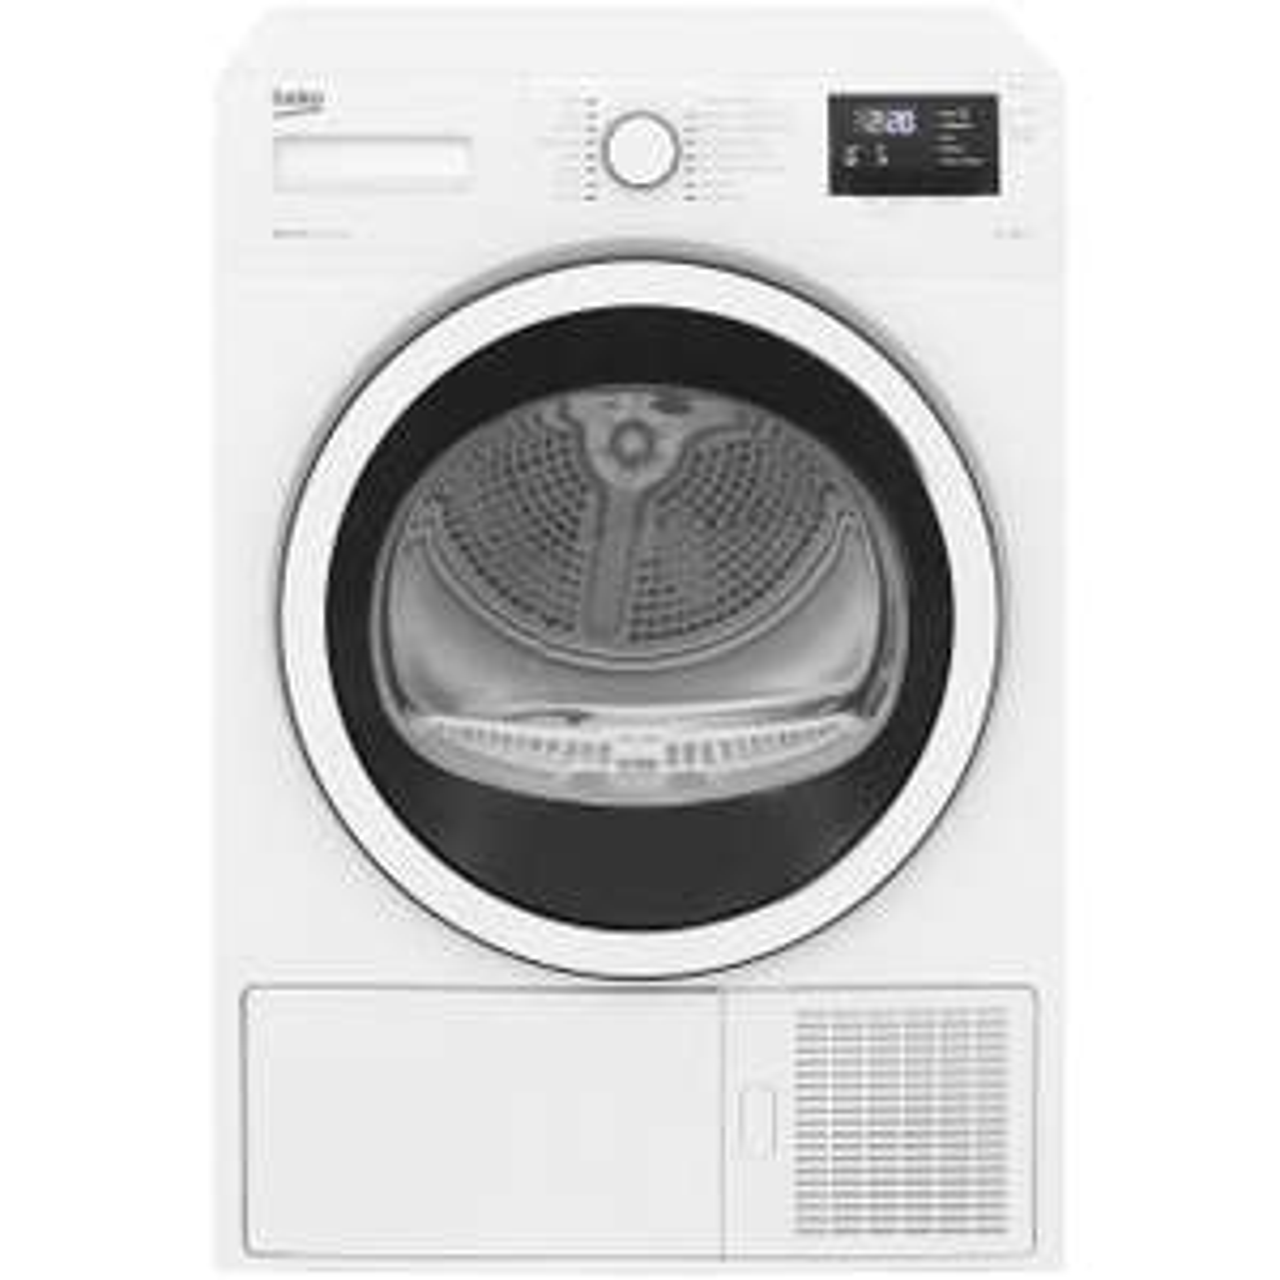 Beko 7kg Tumble Dryer - A++ Heat Pump DHR73431W £249 with code @ AO